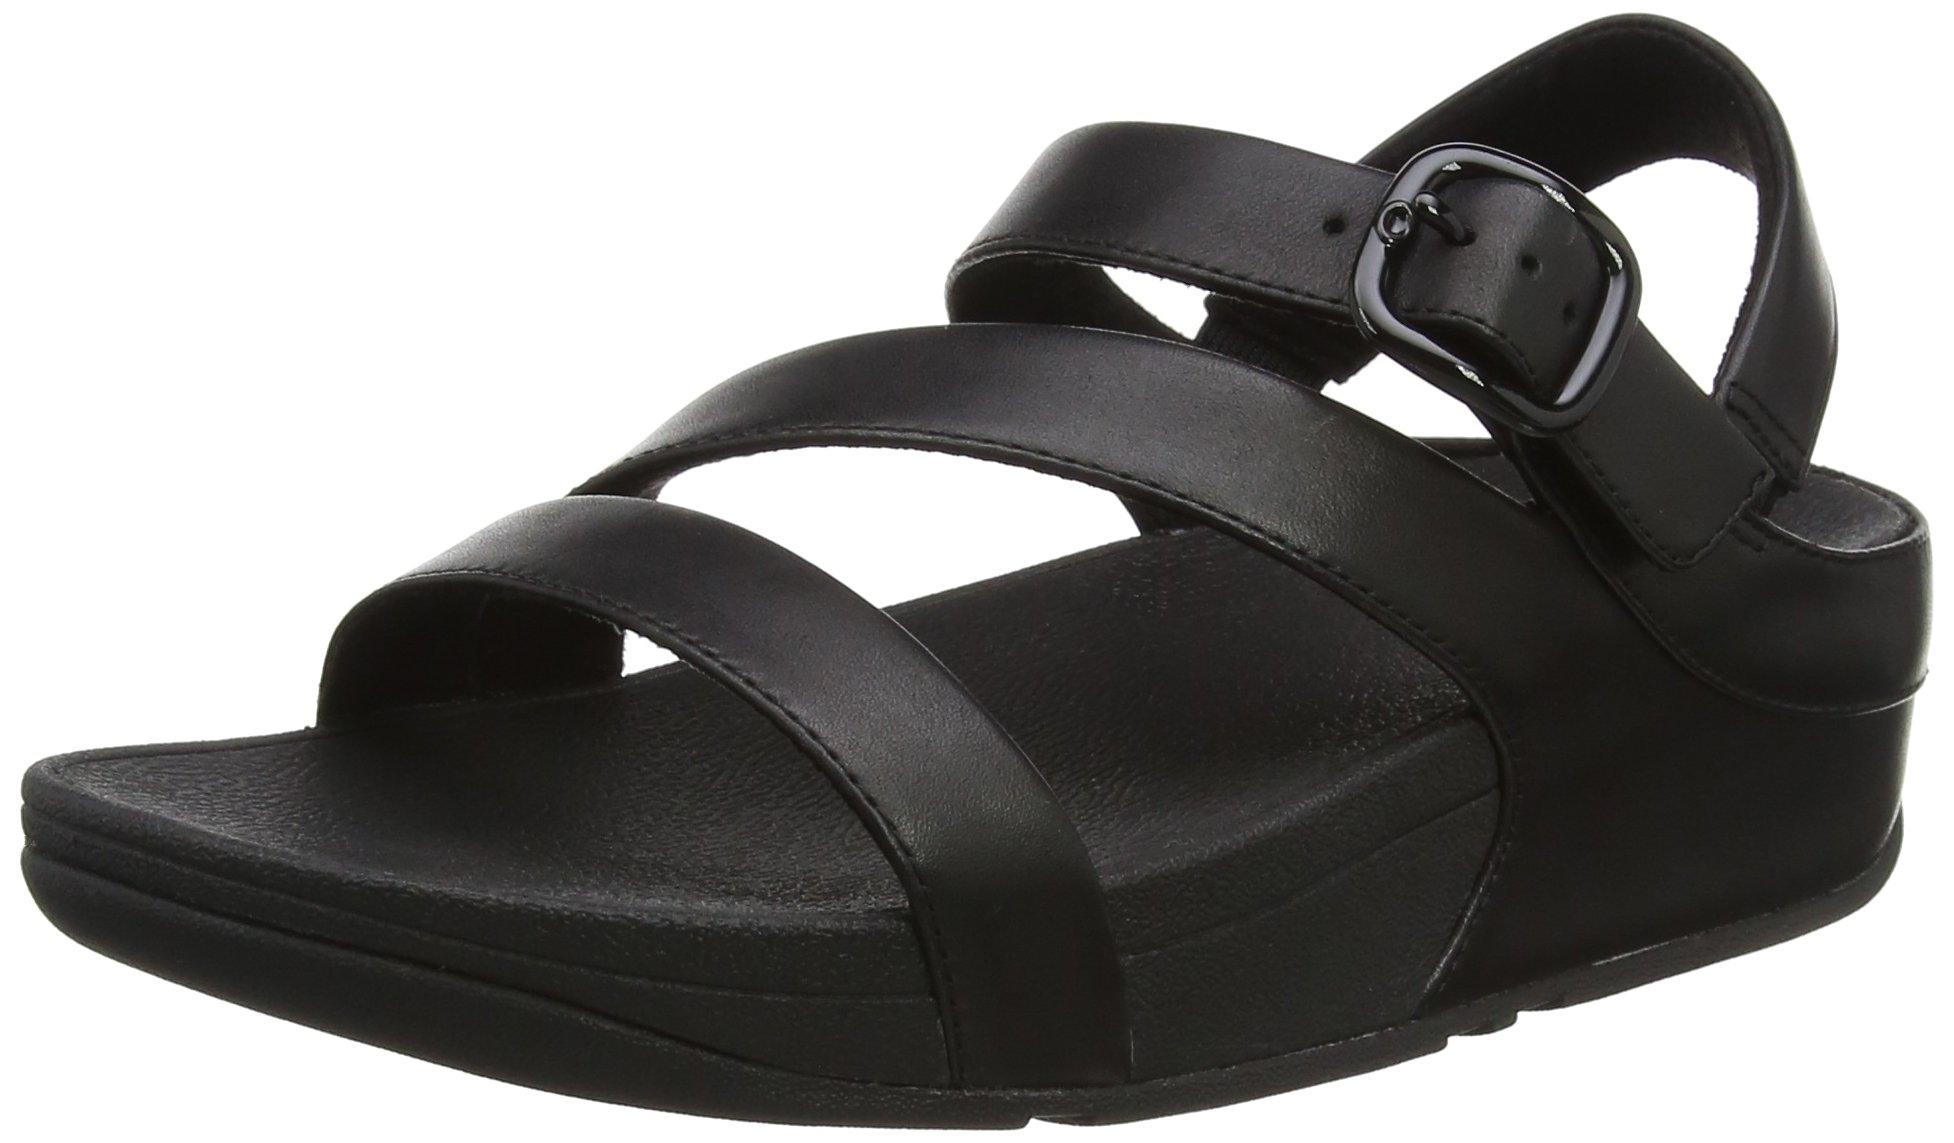 Eu The Ii strap Ouvert Skinny Back 139 SandalsBout Fitflop FemmeNoirblack XZTOiPku